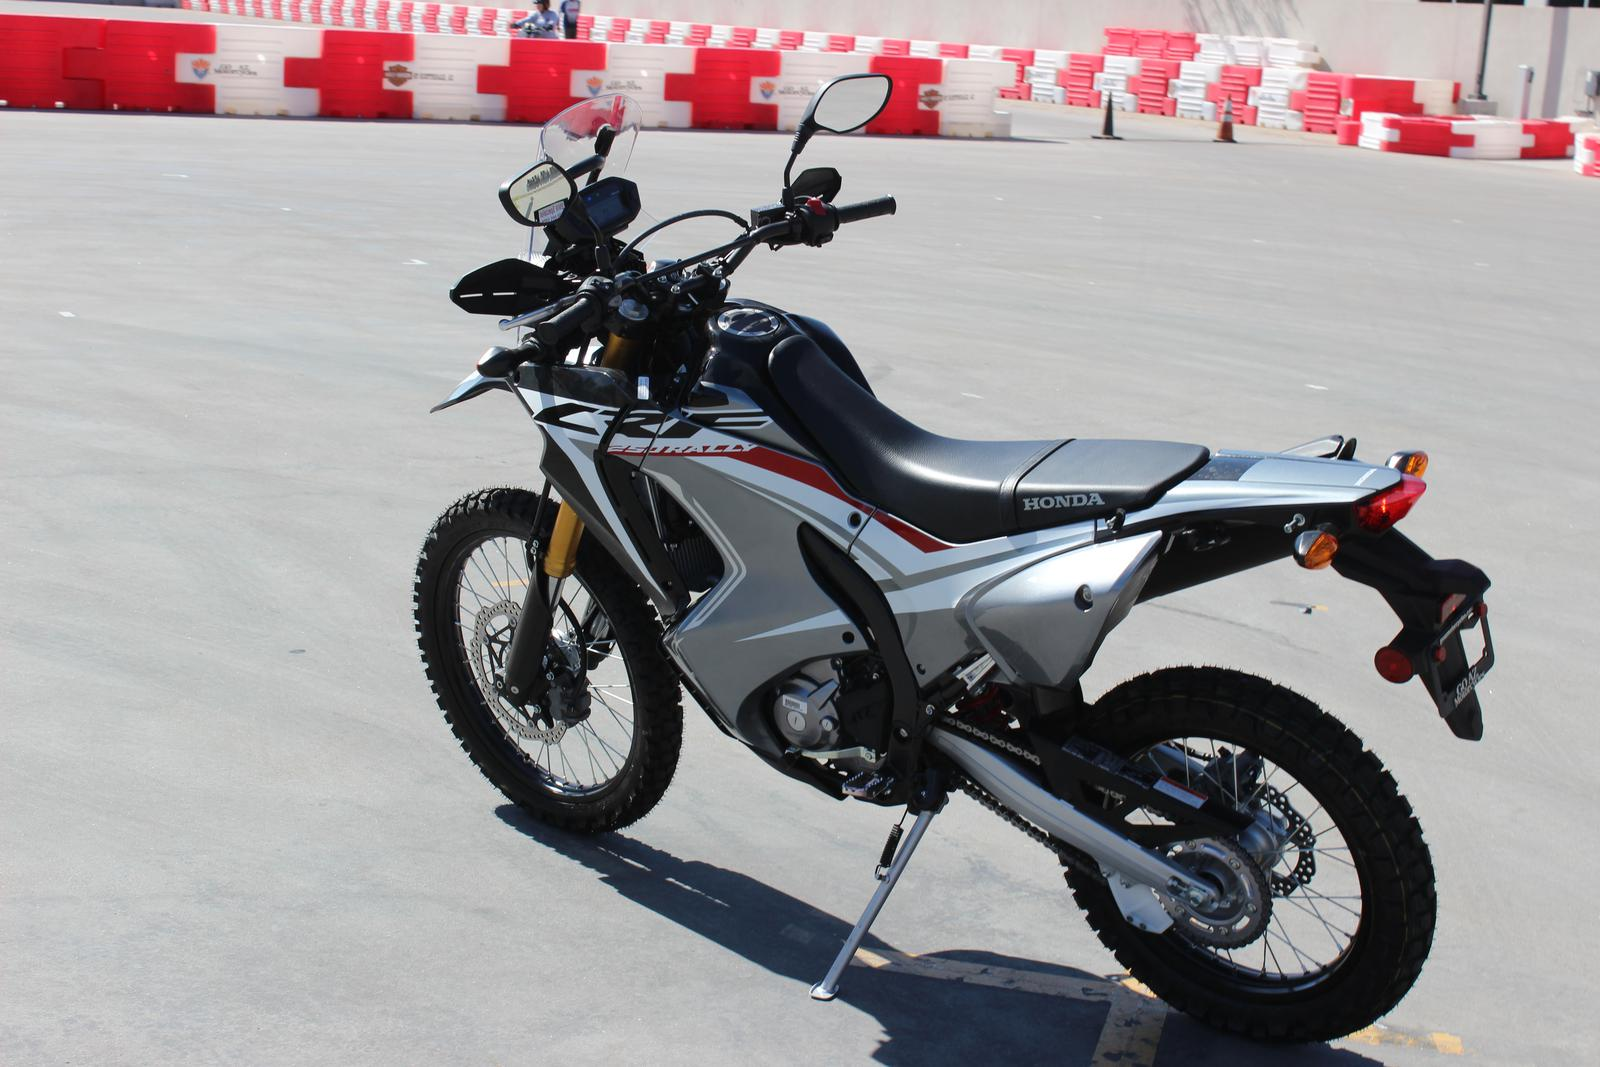 2018 Honda Crf250l Rally For Sale In Scottsdale Az Go Az